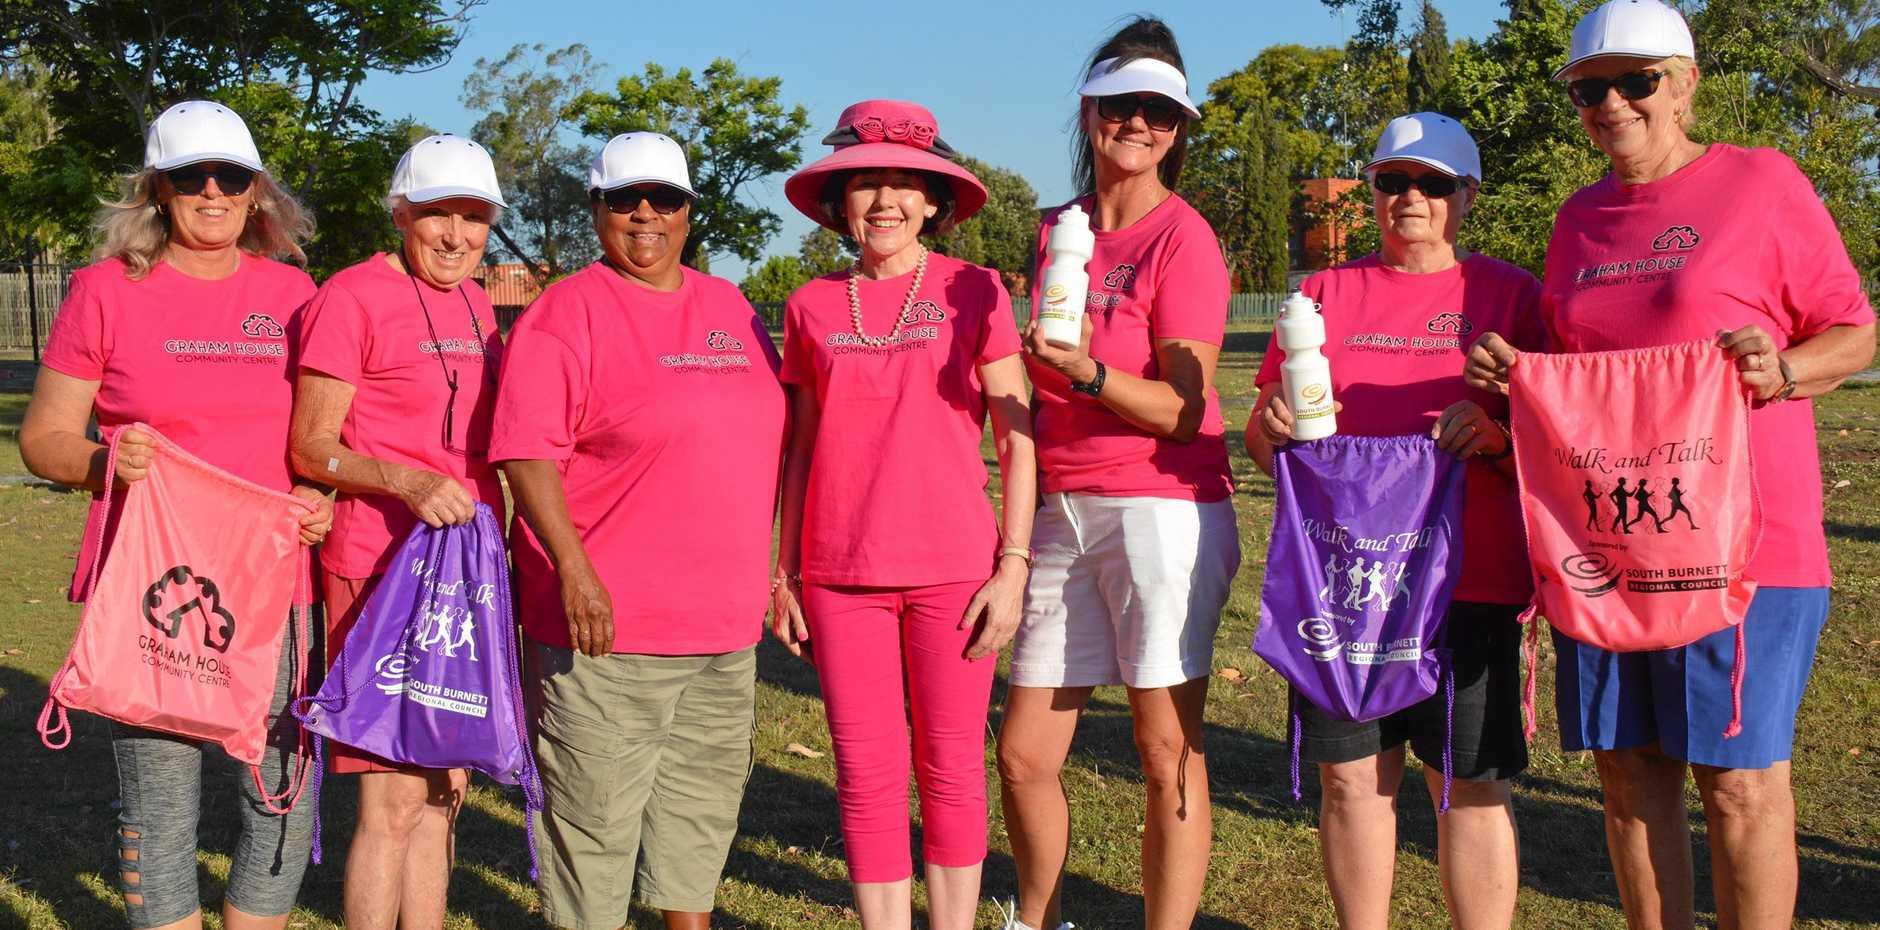 ACTIVE: Dot Sempf, Trish Seillor, Elizabeth Kennell, Kathy Duff, Iris Ferguson, Jan Ferguson and Lorainne Michel get active in the Walk and Talk group in Murgon.